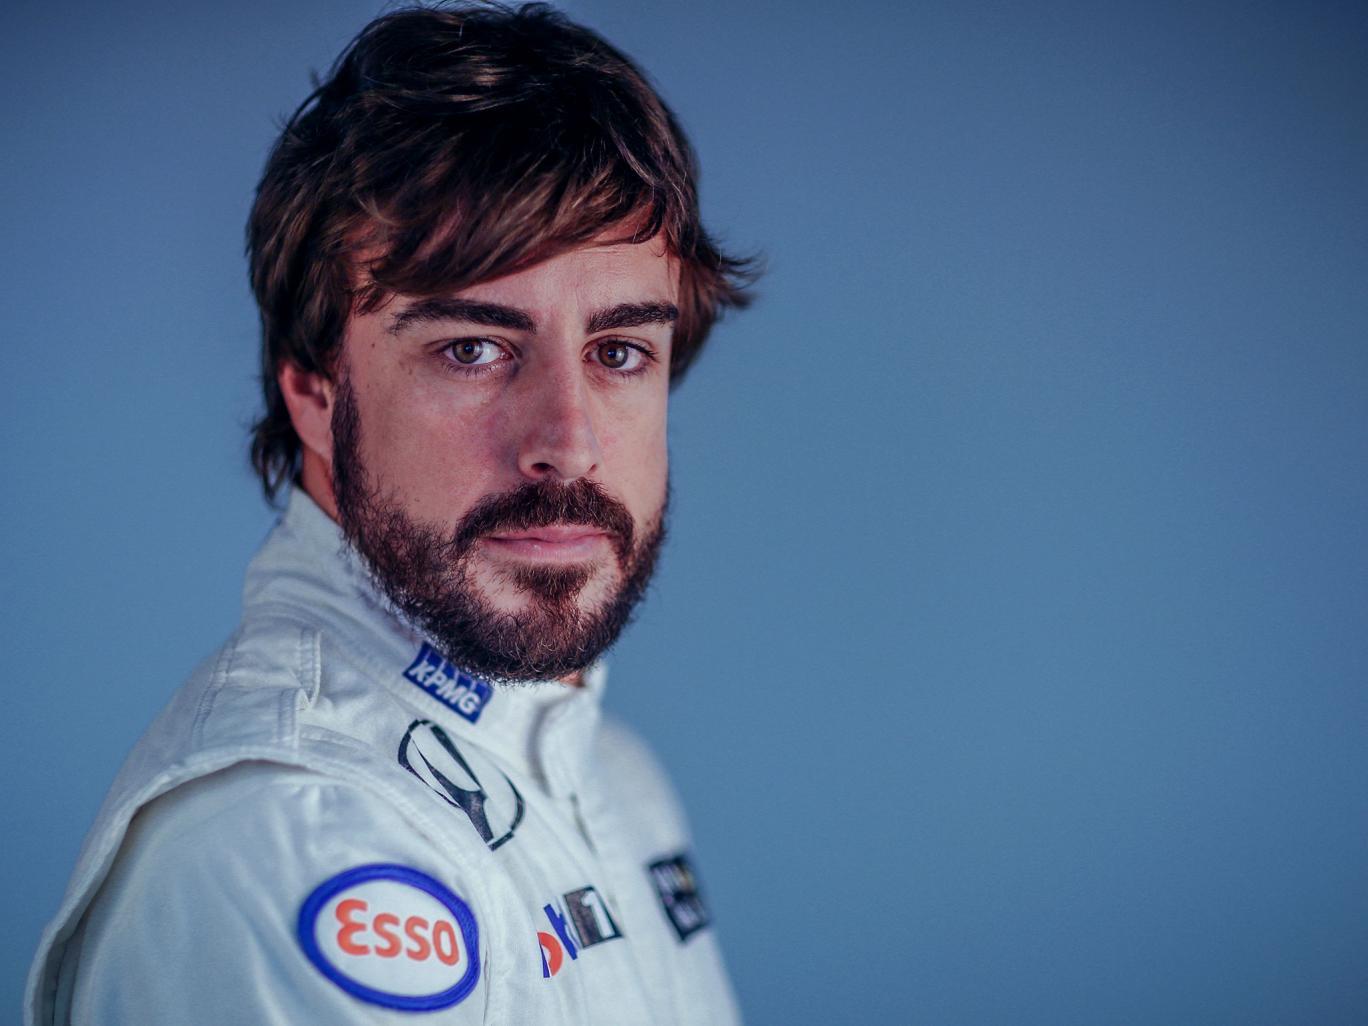 Fernando Alonso fond cran wallpaper Sportune 1368x1026